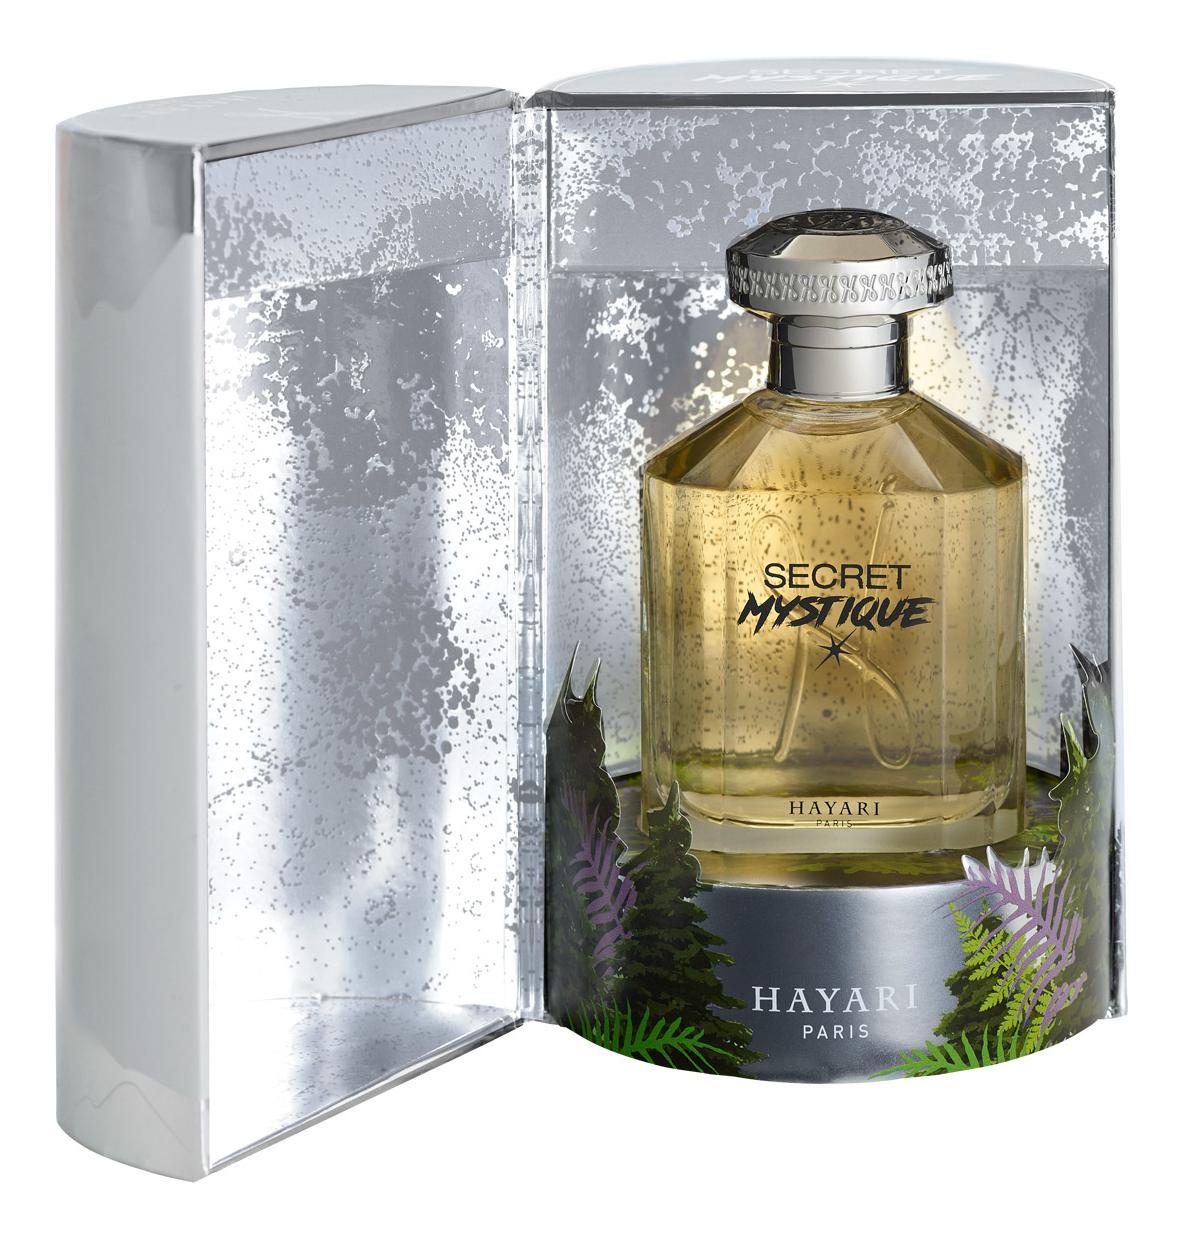 Hayari Parfums Secret Mystique